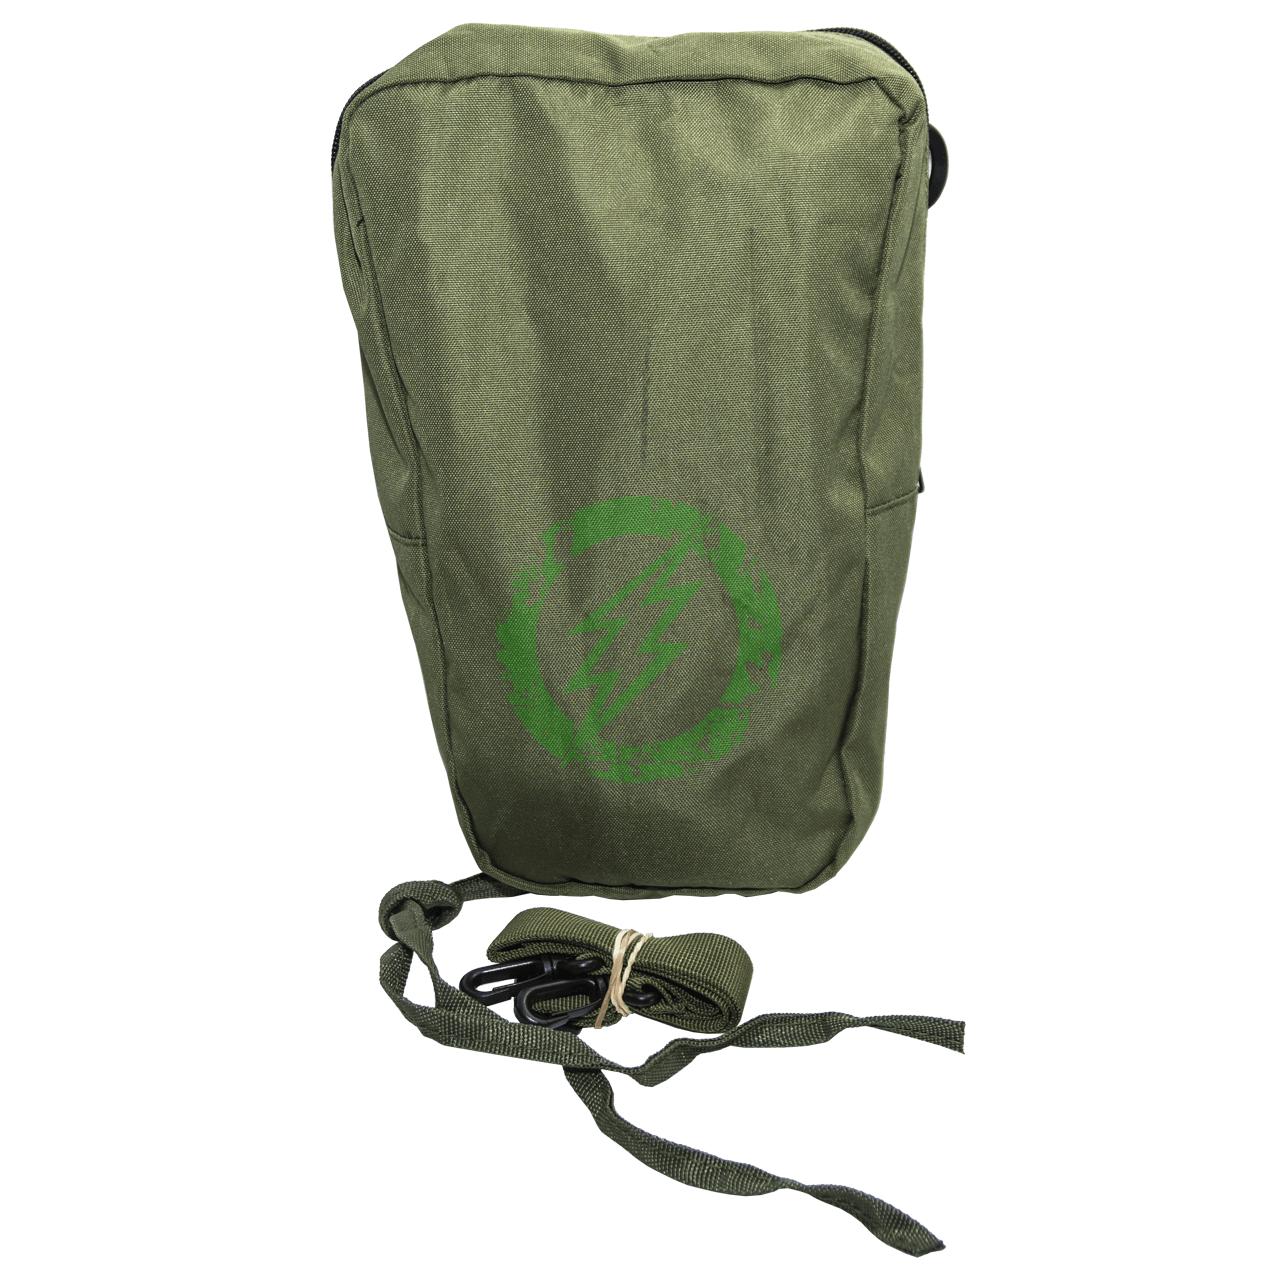 Photonis 16 Mono PD Pro-M with 4G Tube Bag